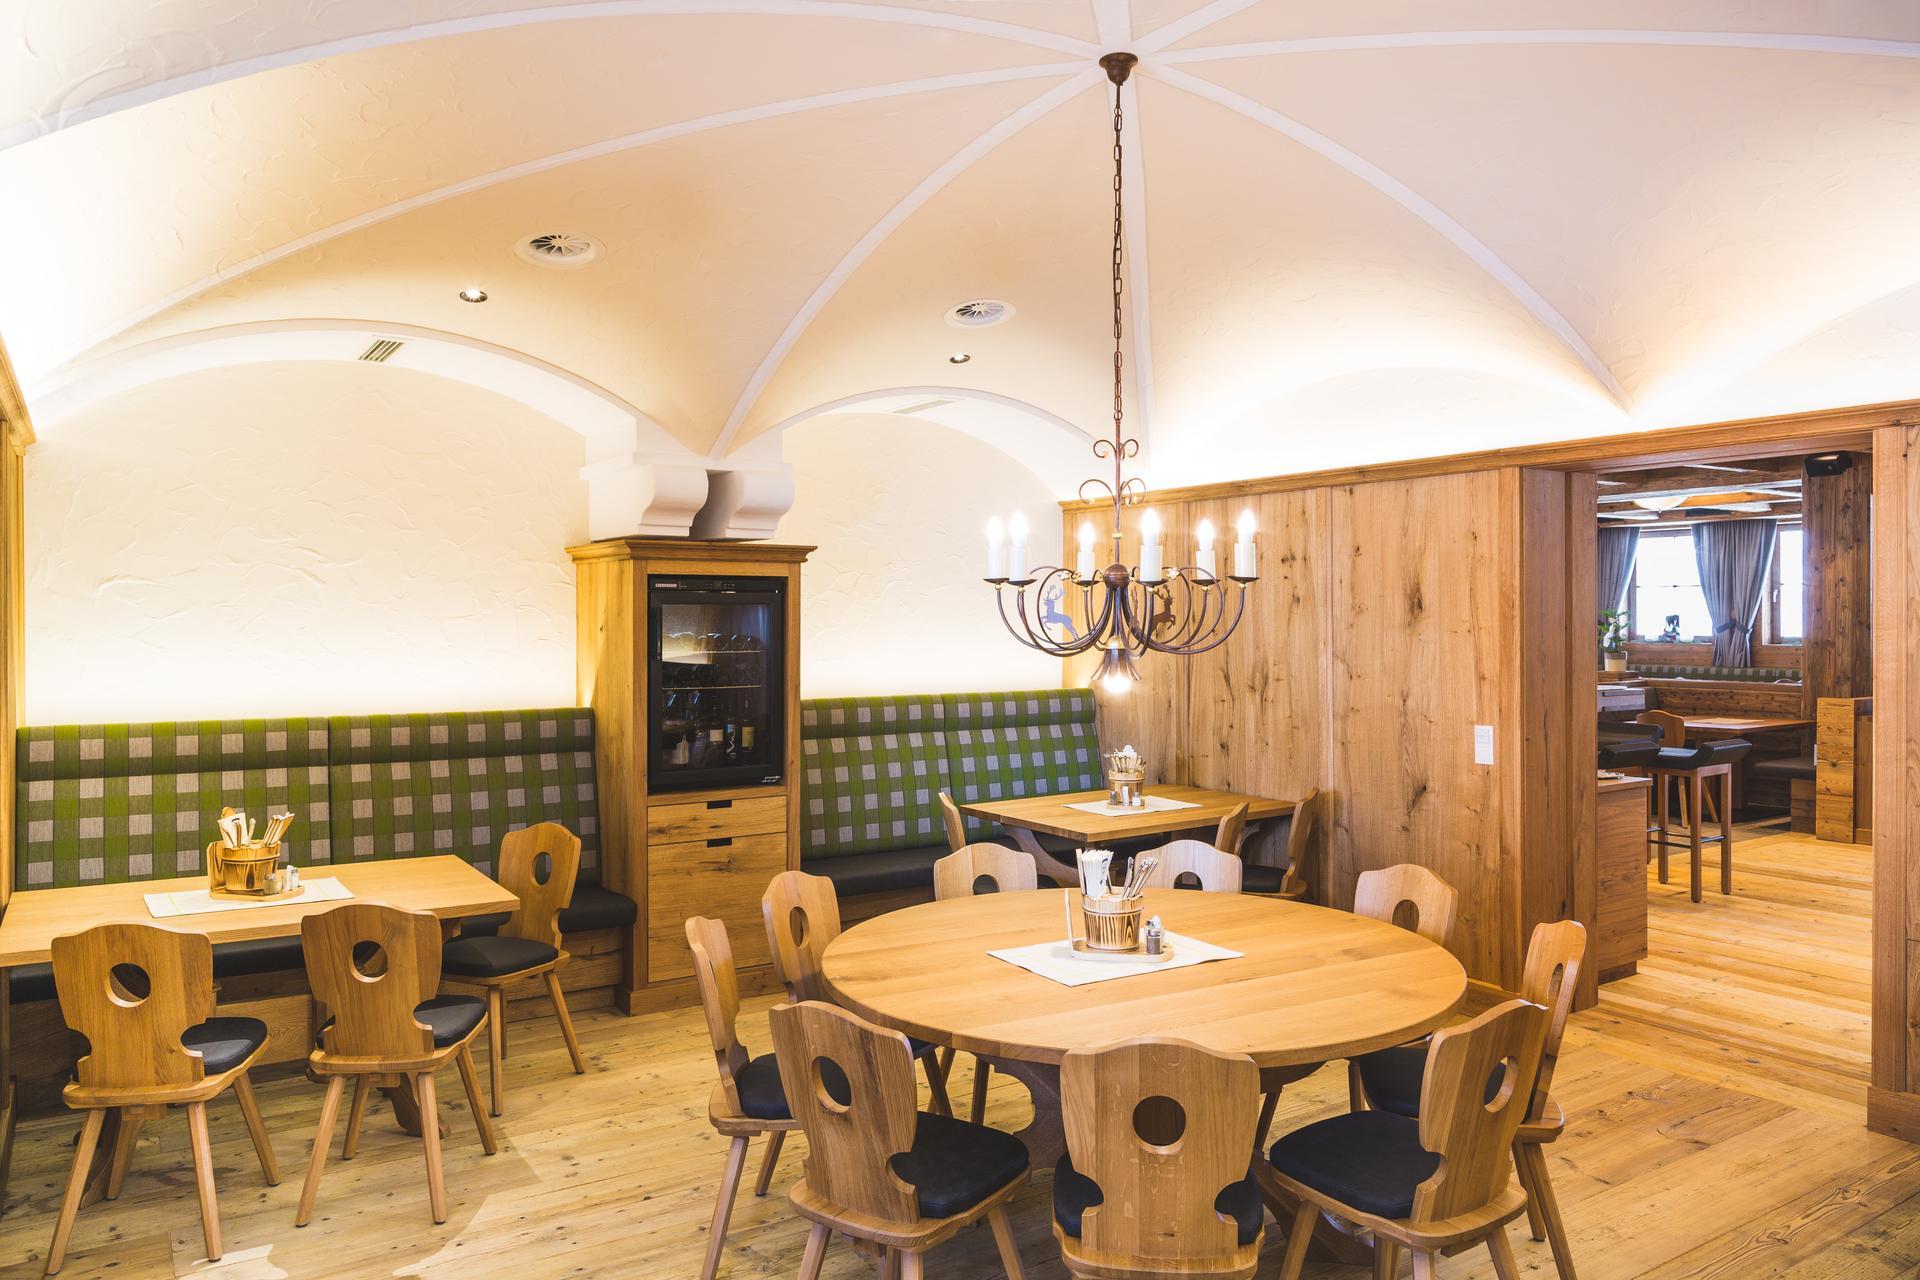 Our ski hut - Arlberg Thaja St. Christoph